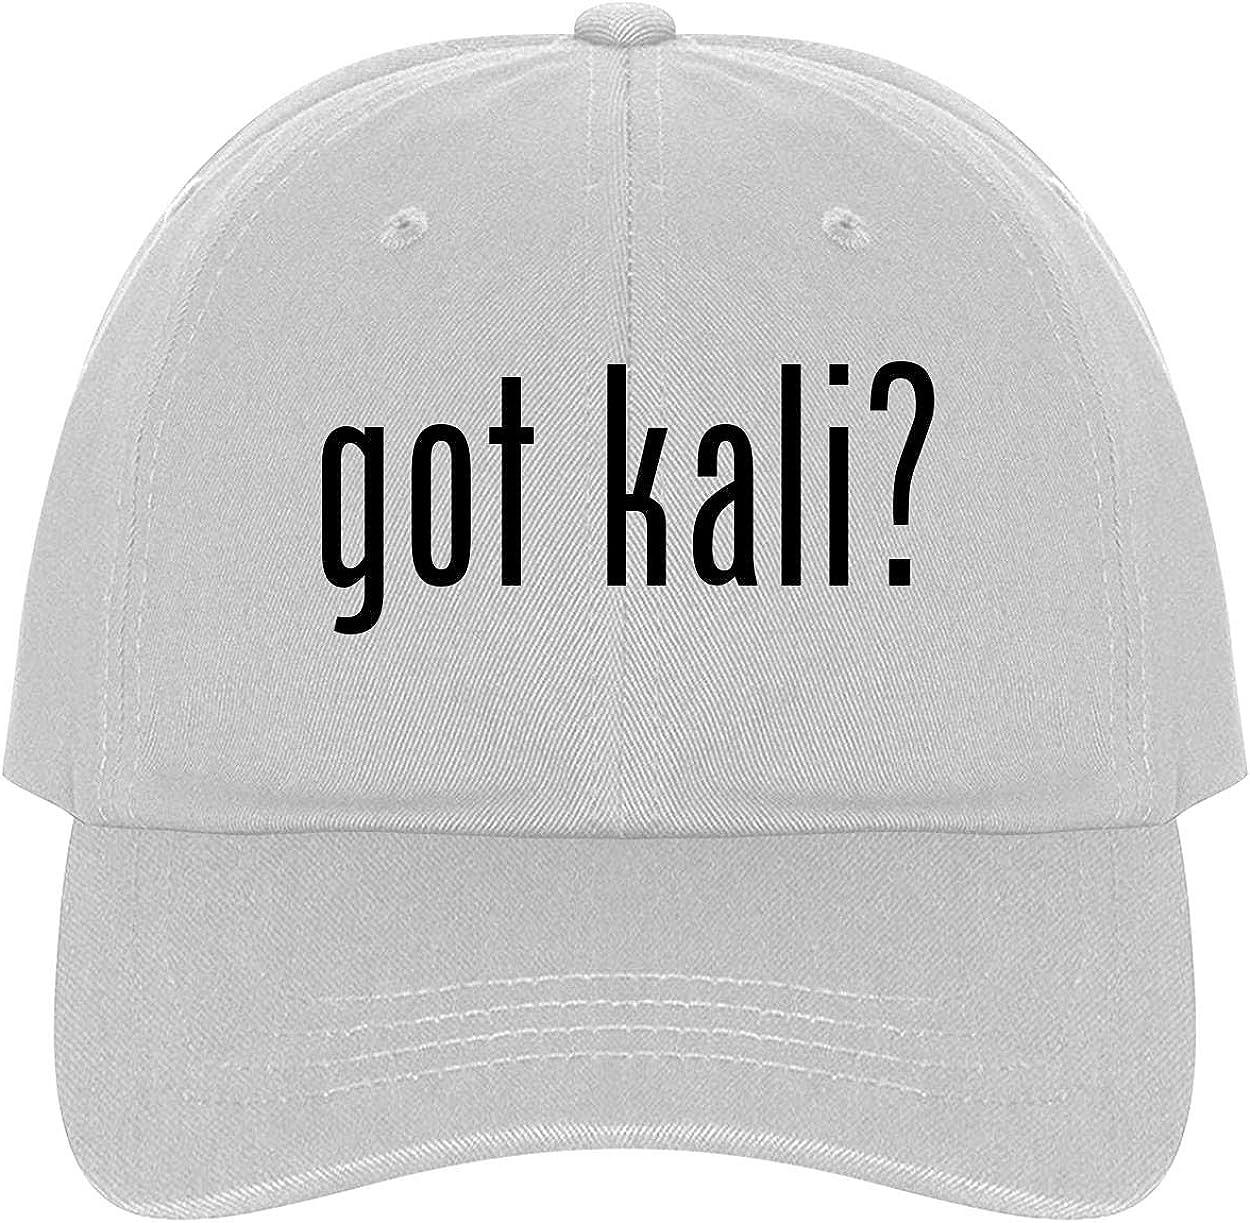 A Nice Comfortable Adjustable Dad Hat Cap The Town Butler got Kali?